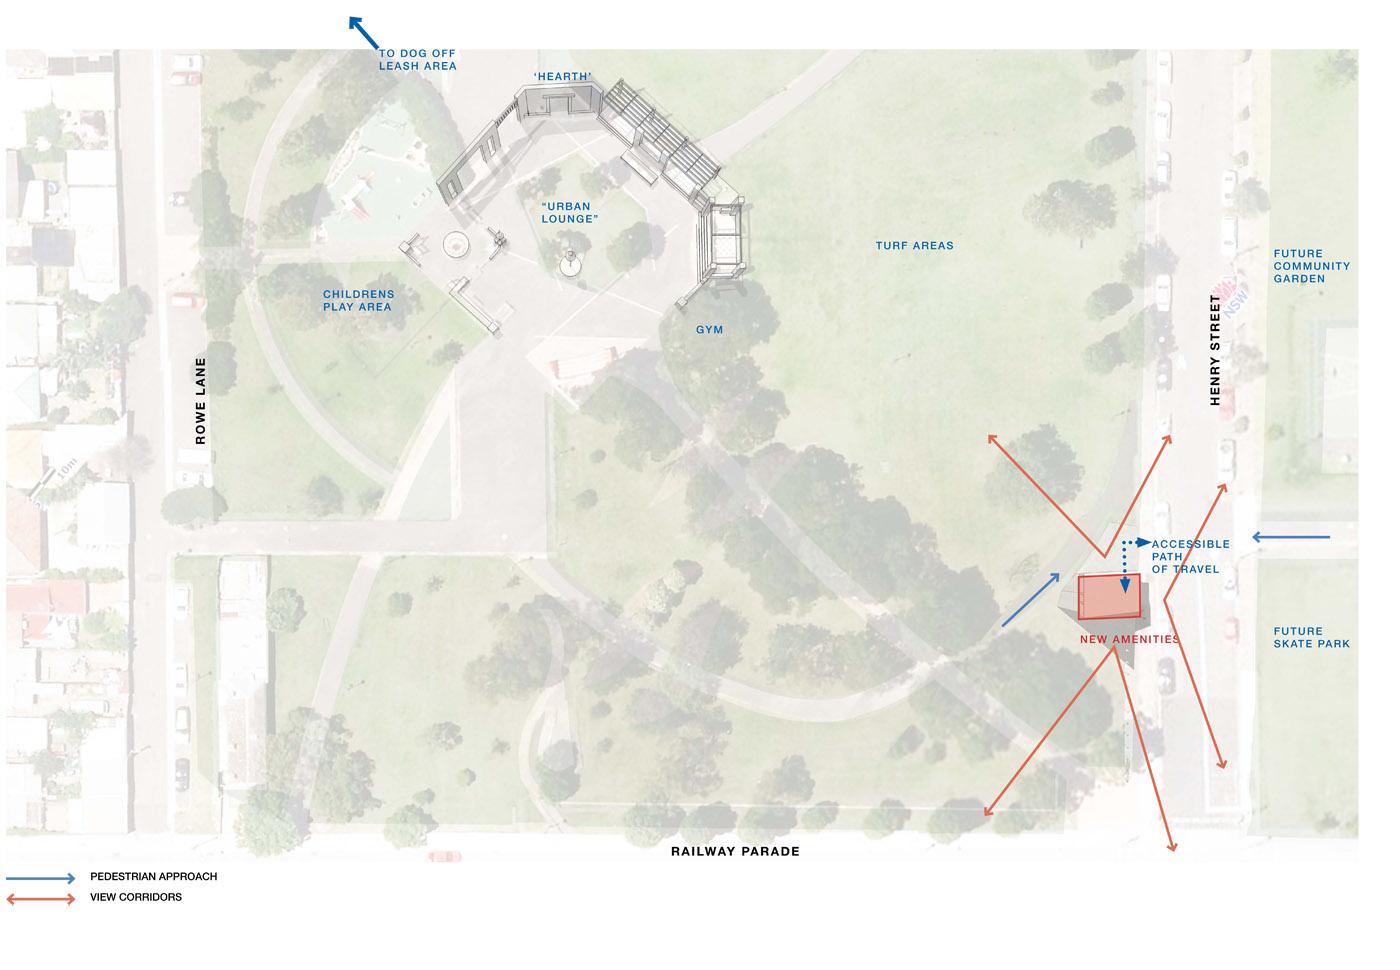 Sydenham Green Amenities by Sam Crawford Architects, Sydney. Site plan.